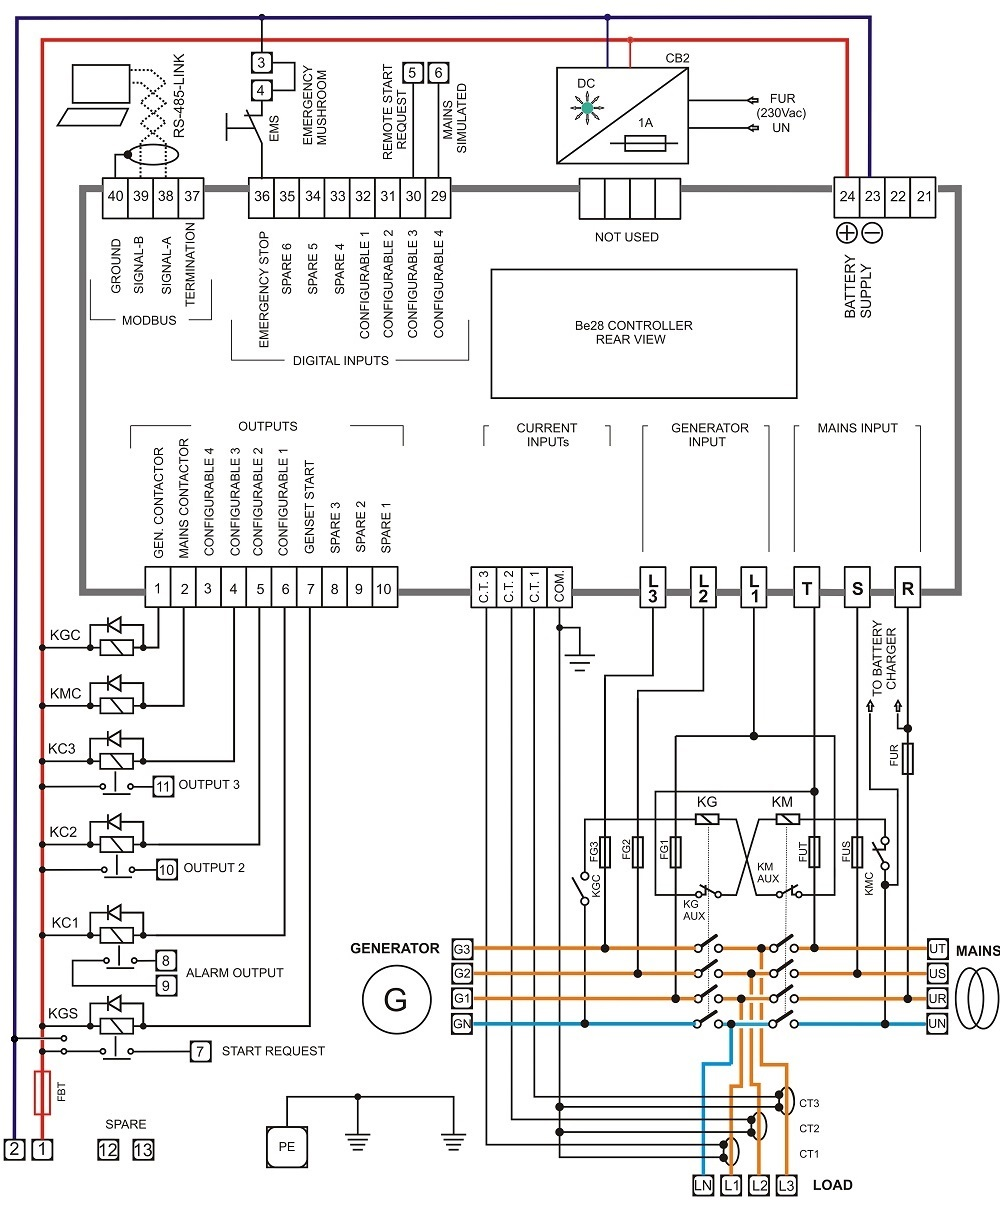 Citroen Xsara Airbag Wiring Diagram Schematic Diagrams C8 Trusted U2022 Operation